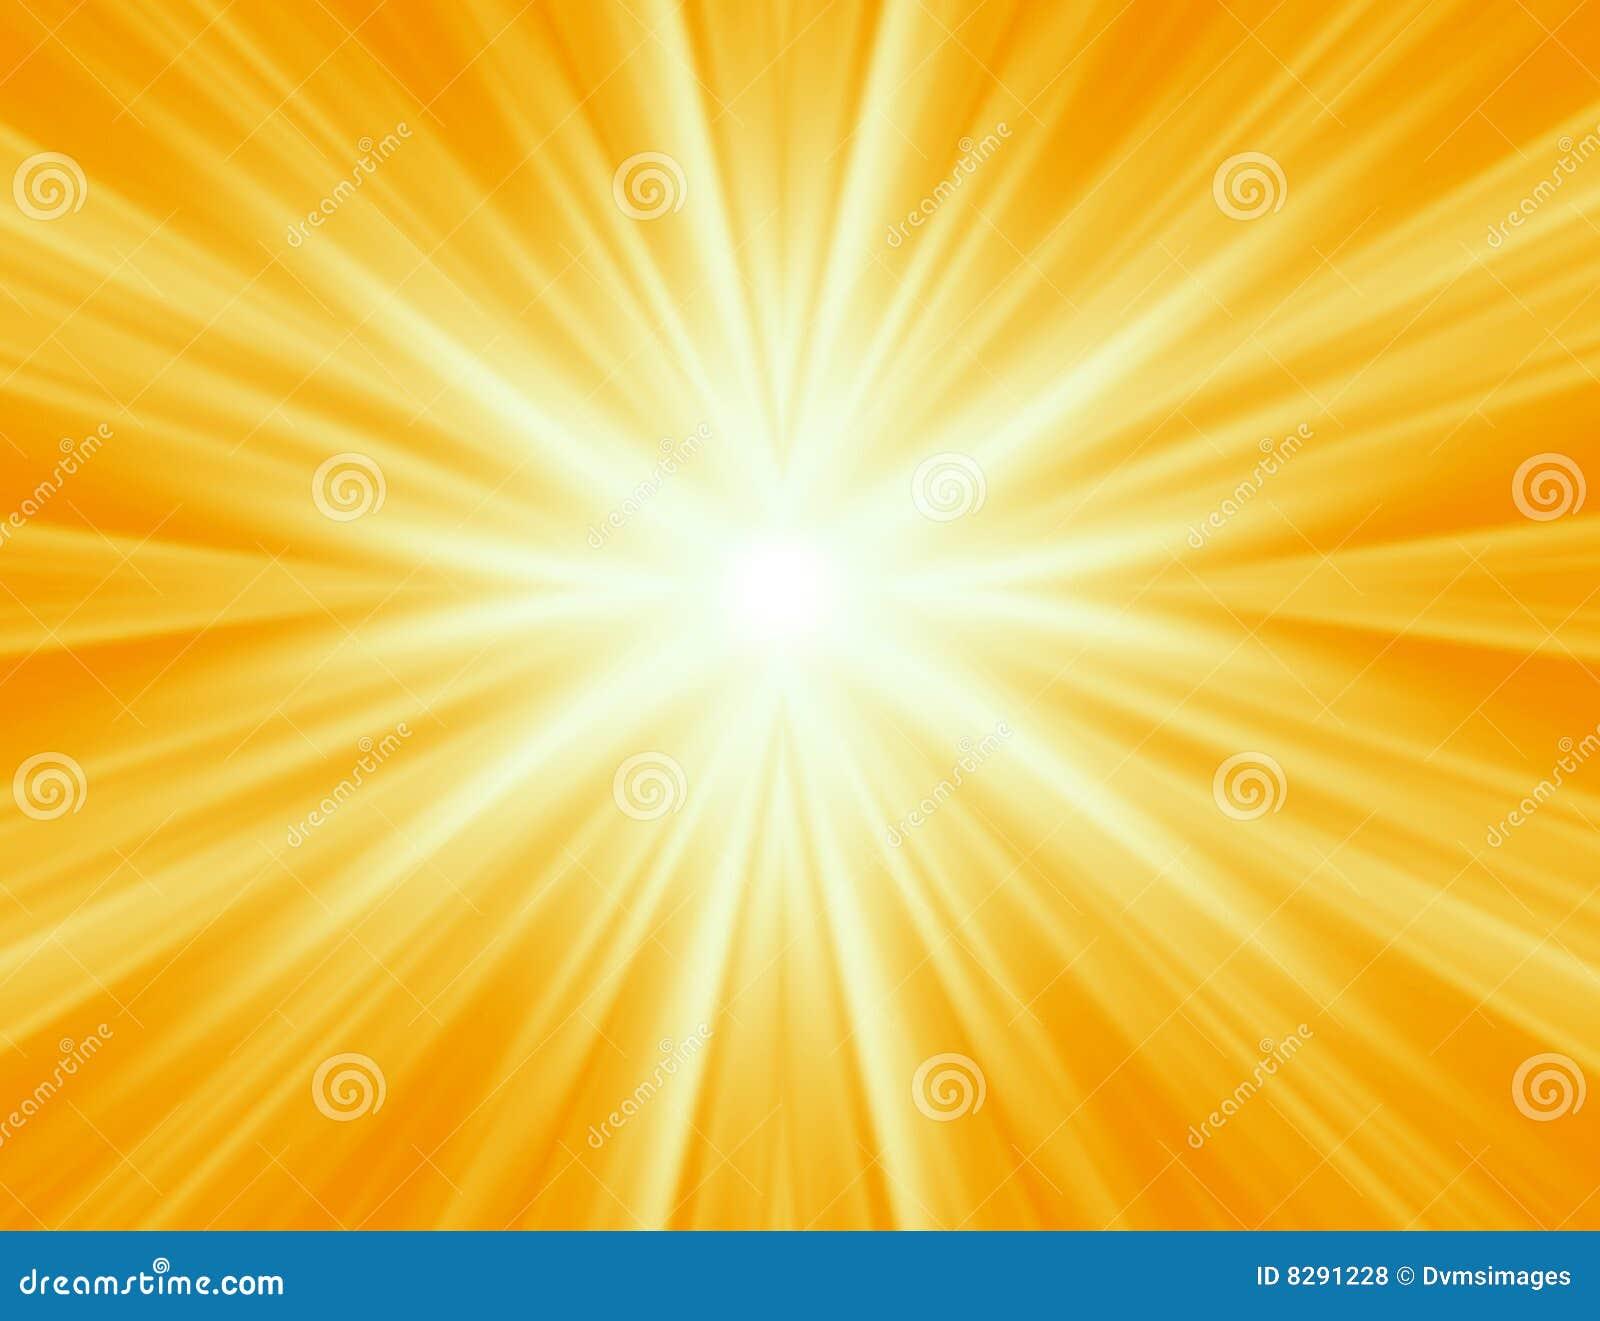 radiating yellow rays royalty free stock photos image